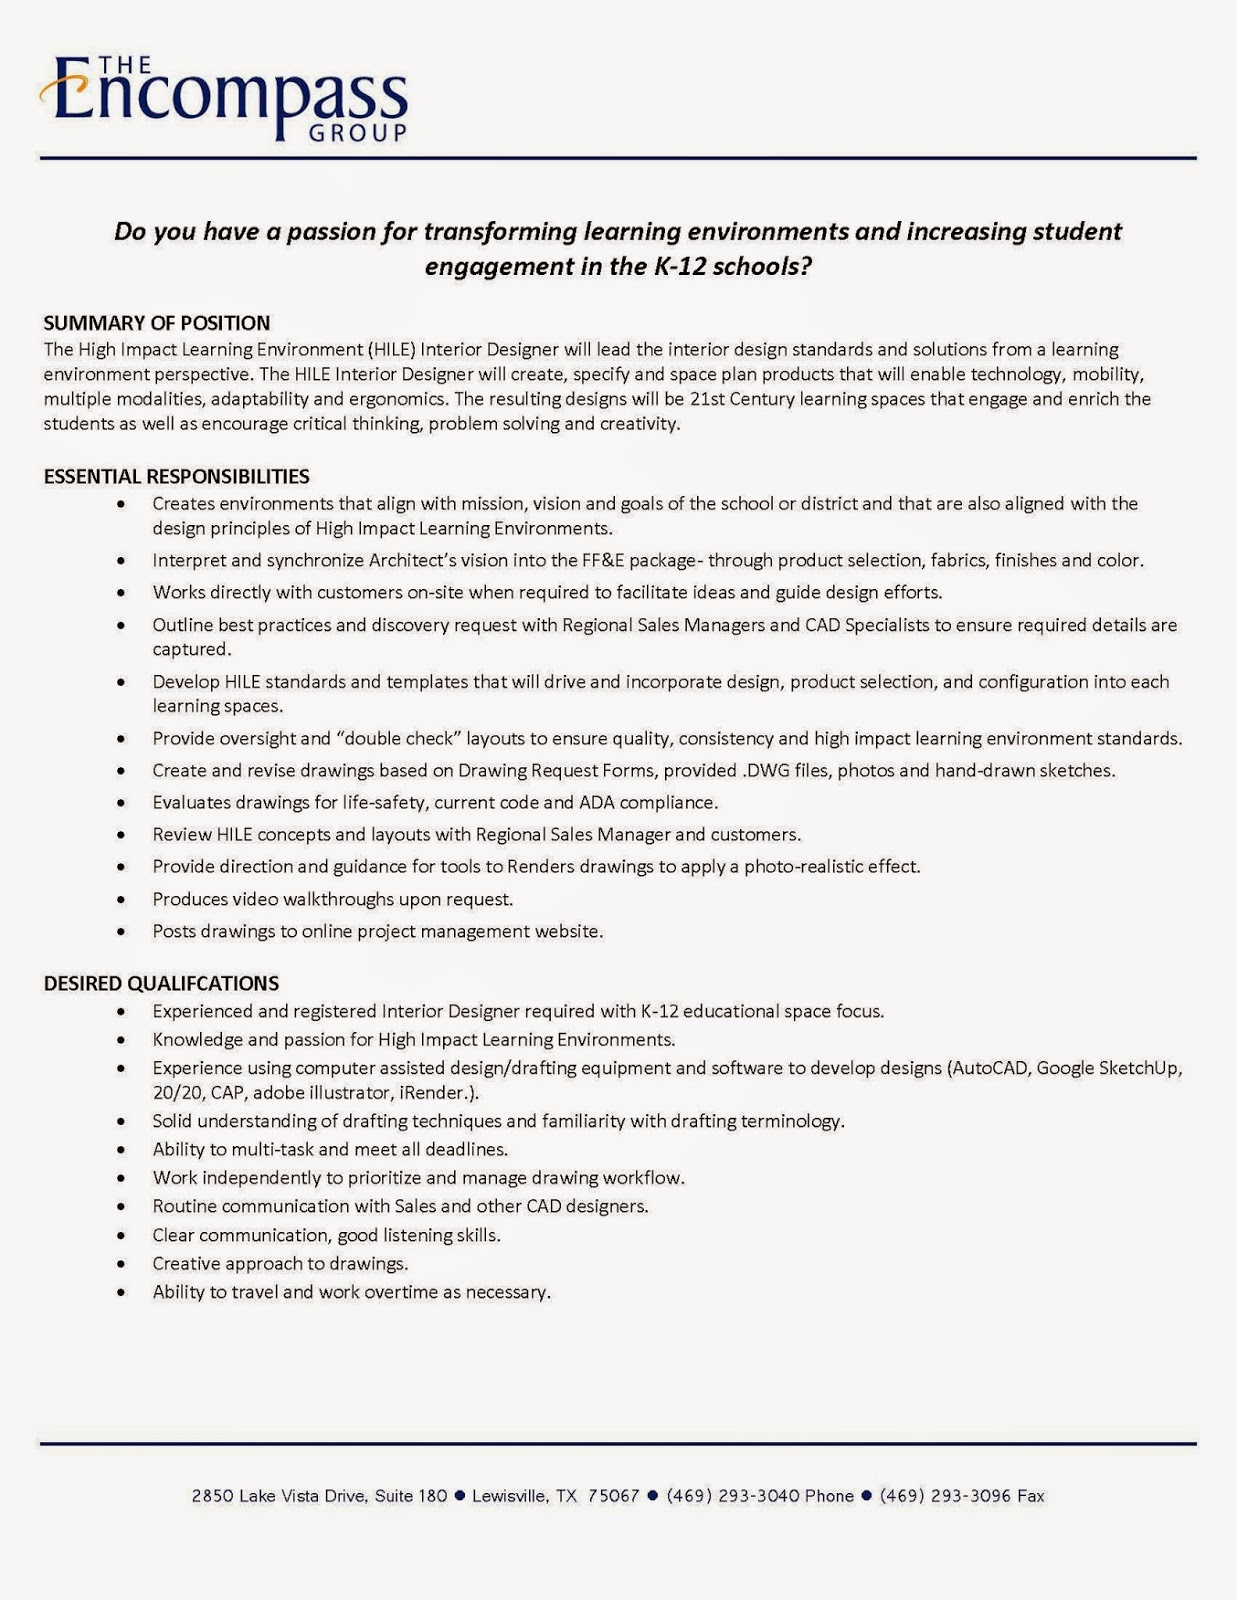 Job Description Of An Interior Designer Interior Designer